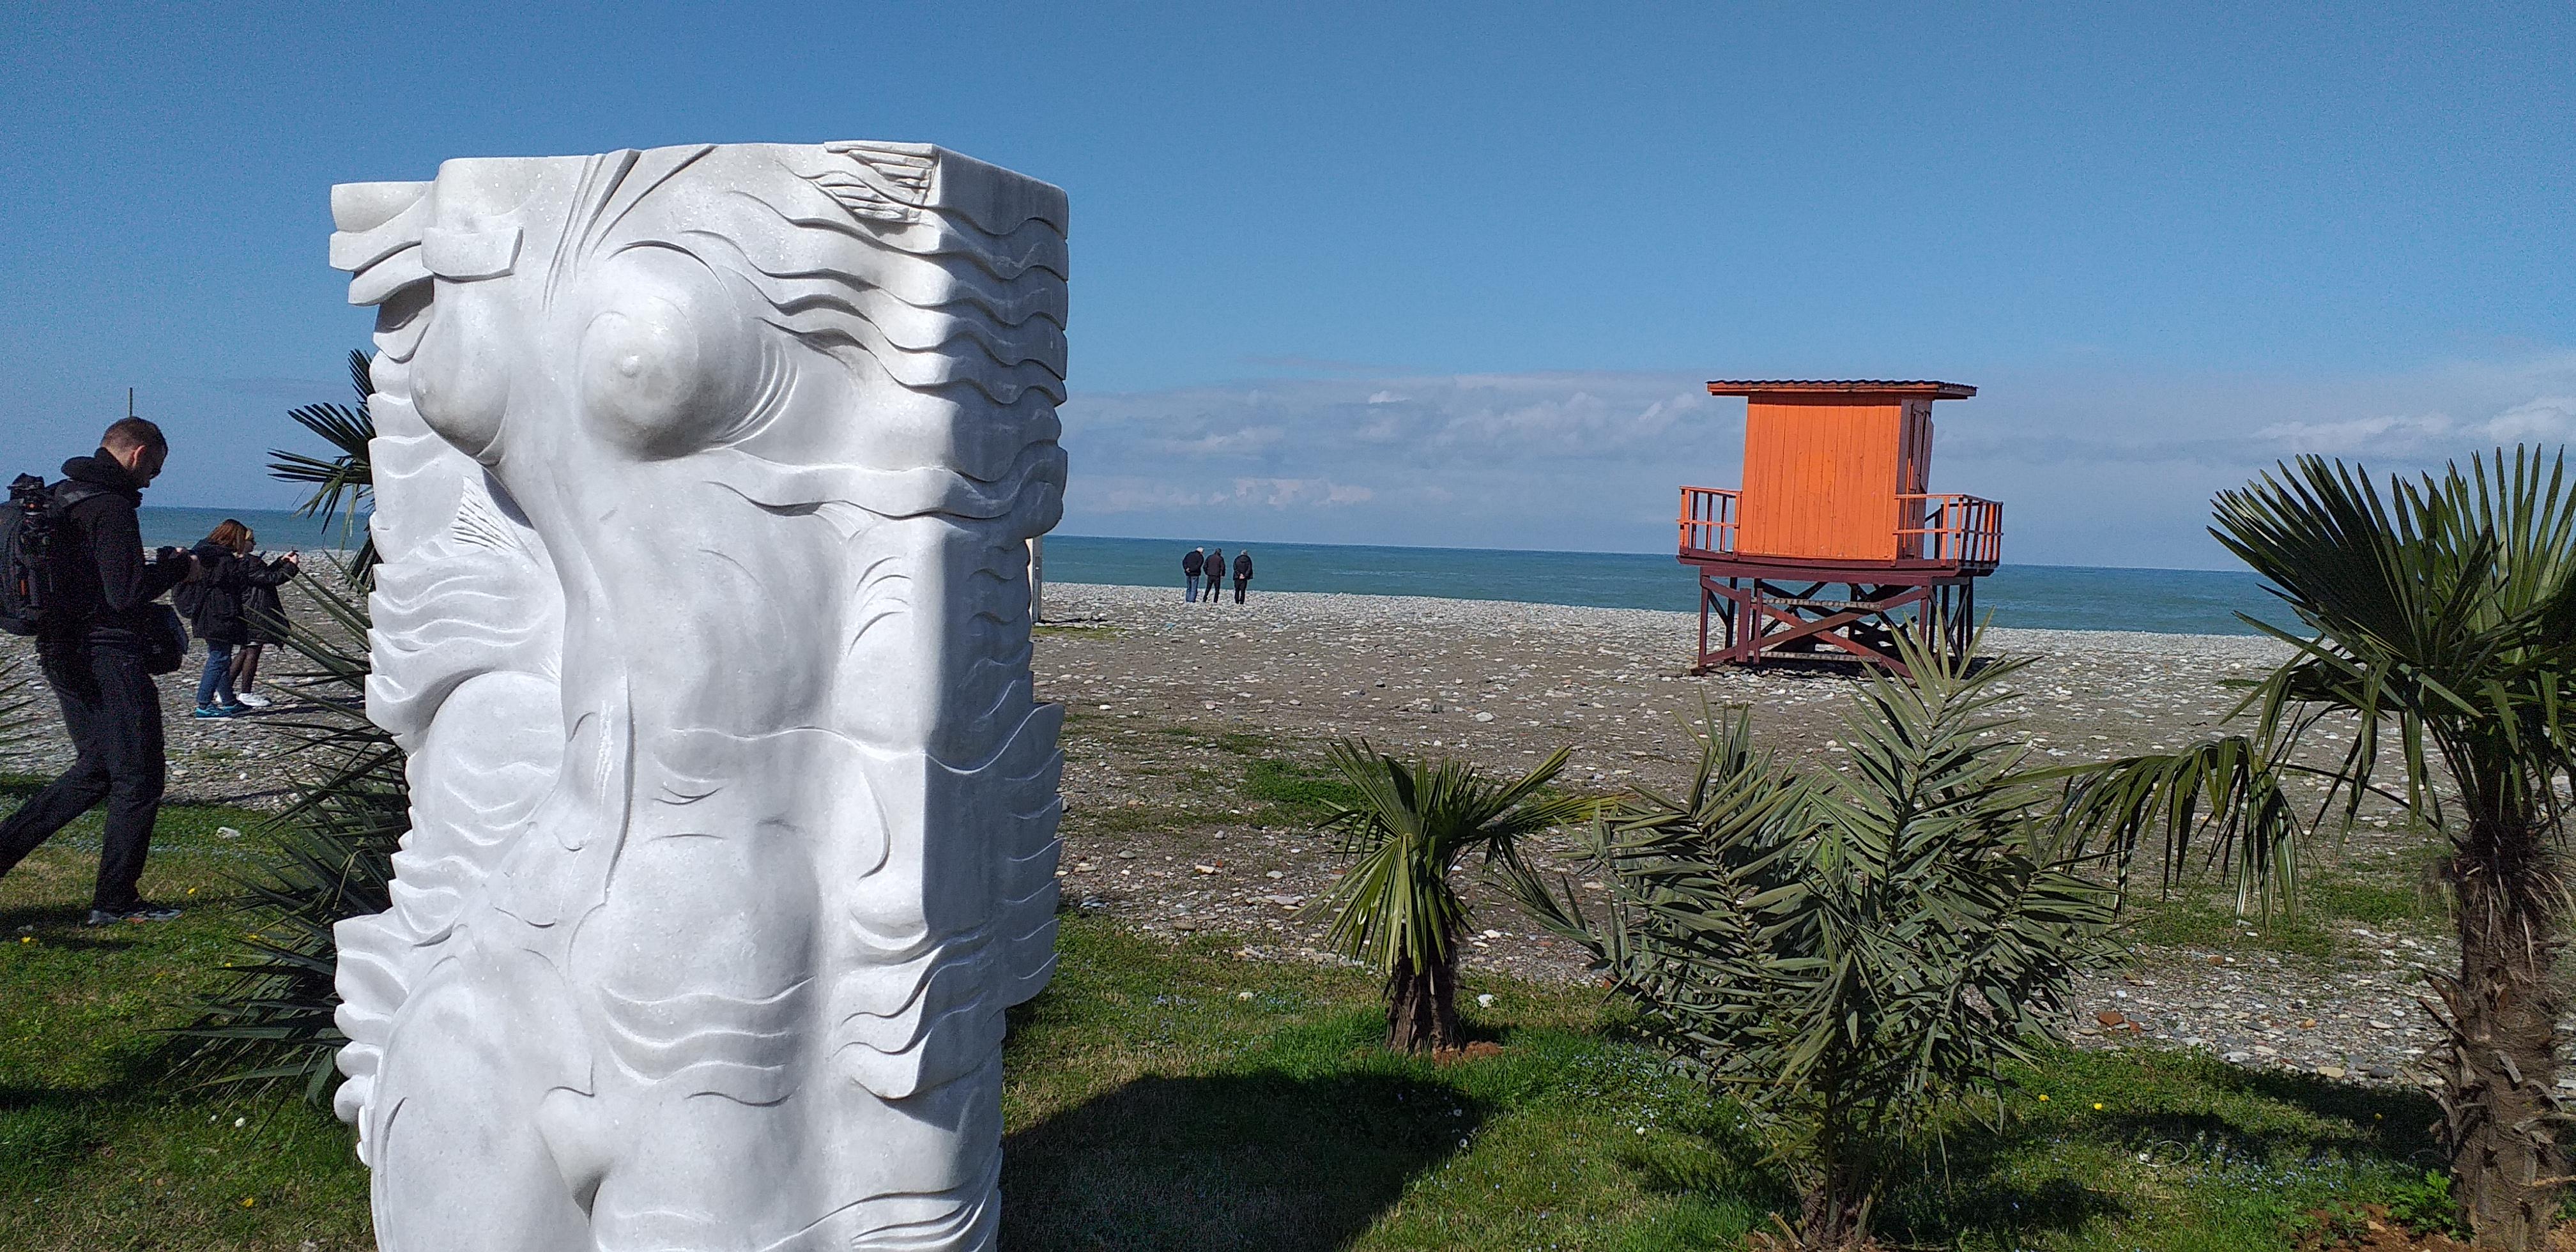 скульптура и будка спасателя на пляже в Батуми